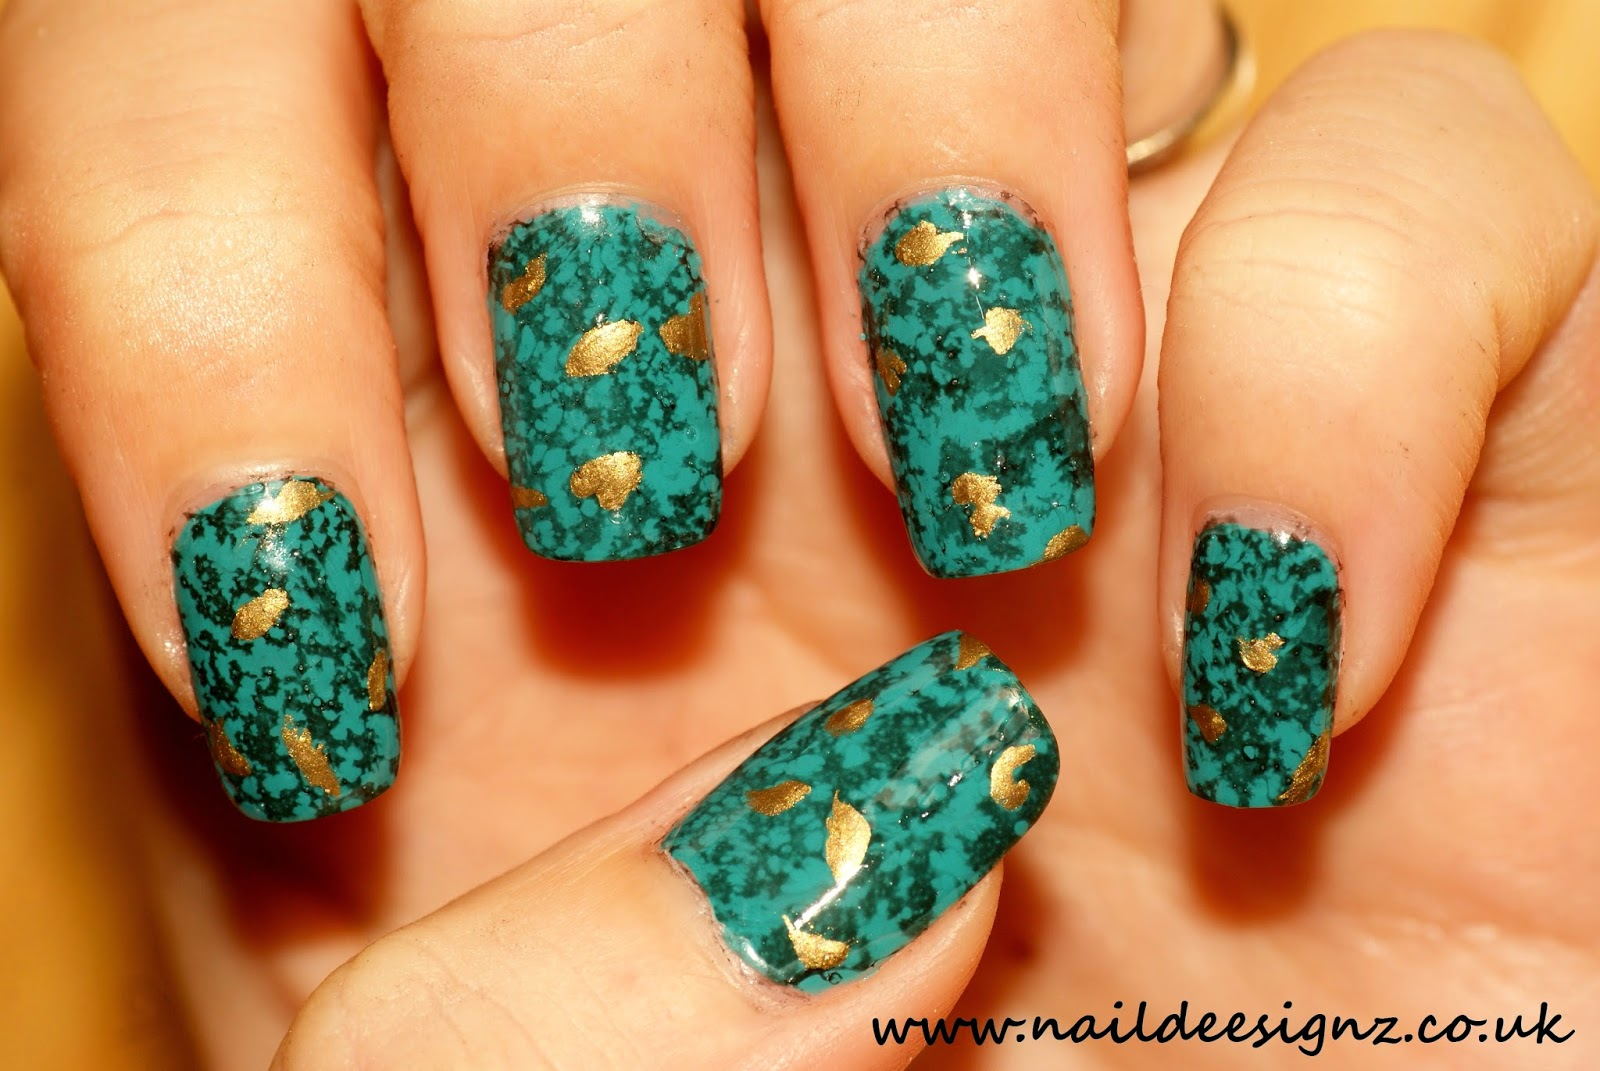 NailDeesignz: Turquoise Stone Nail Art